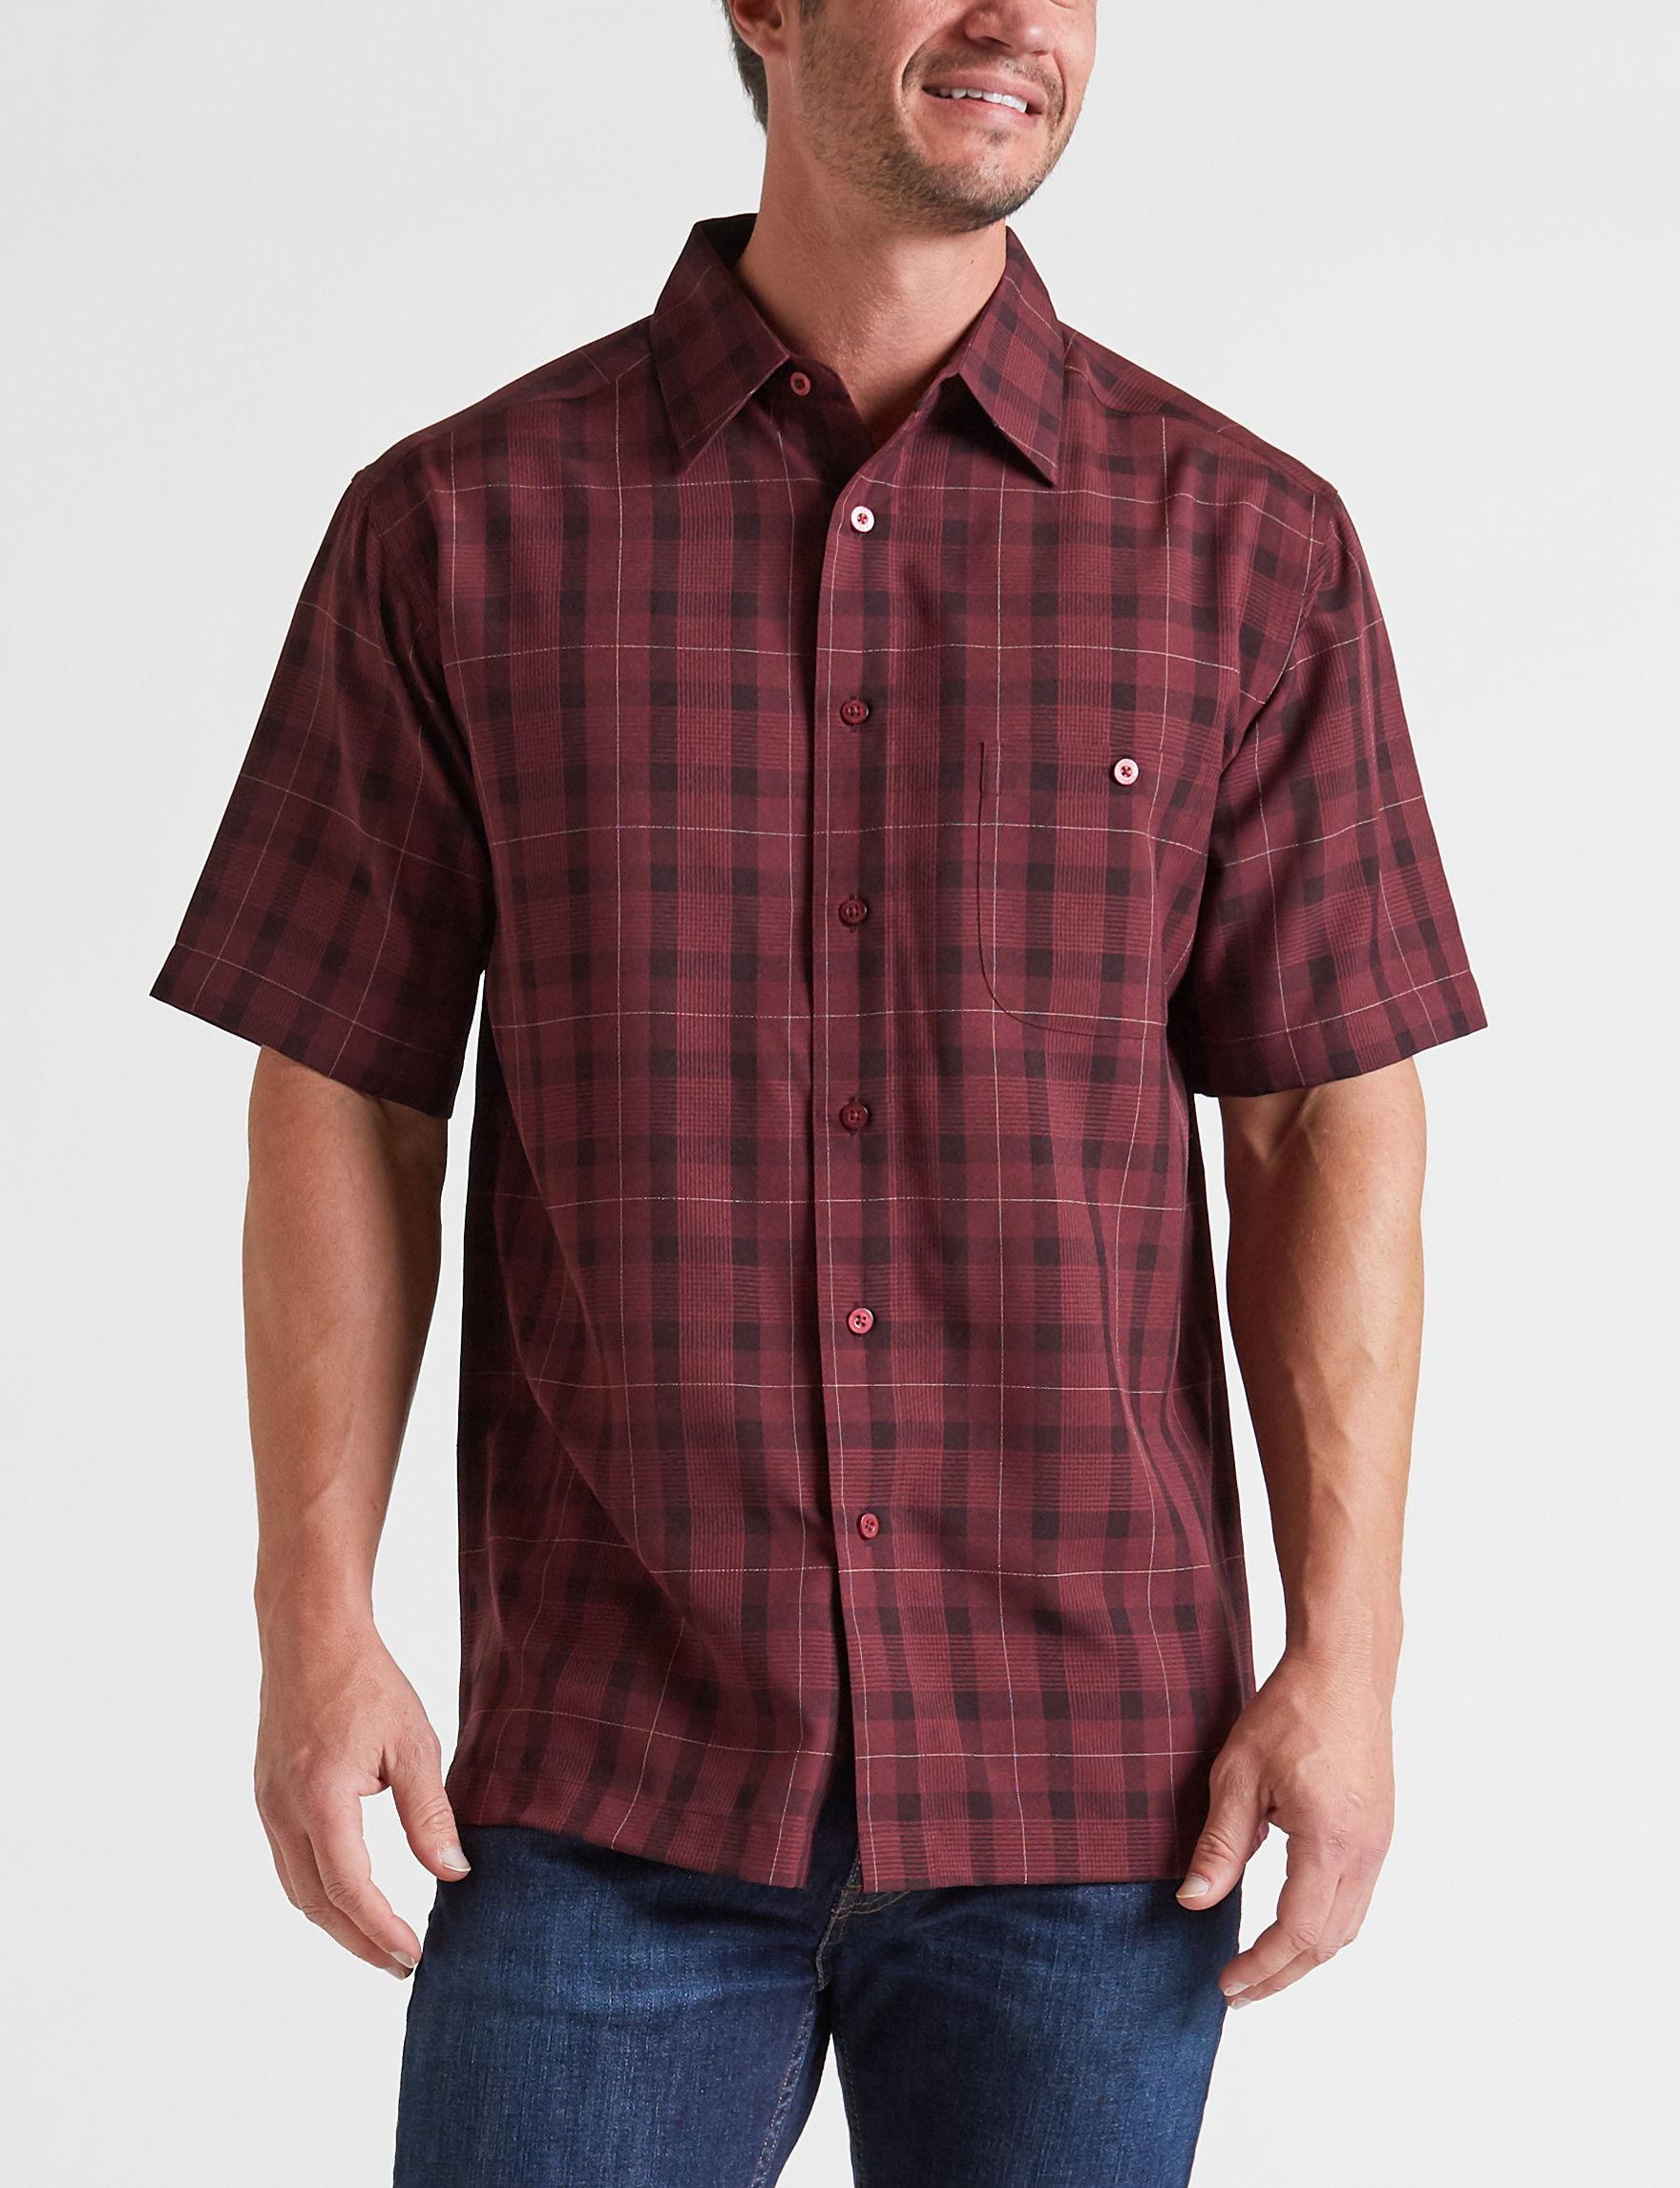 Haggar Wine Casual Button Down Shirts